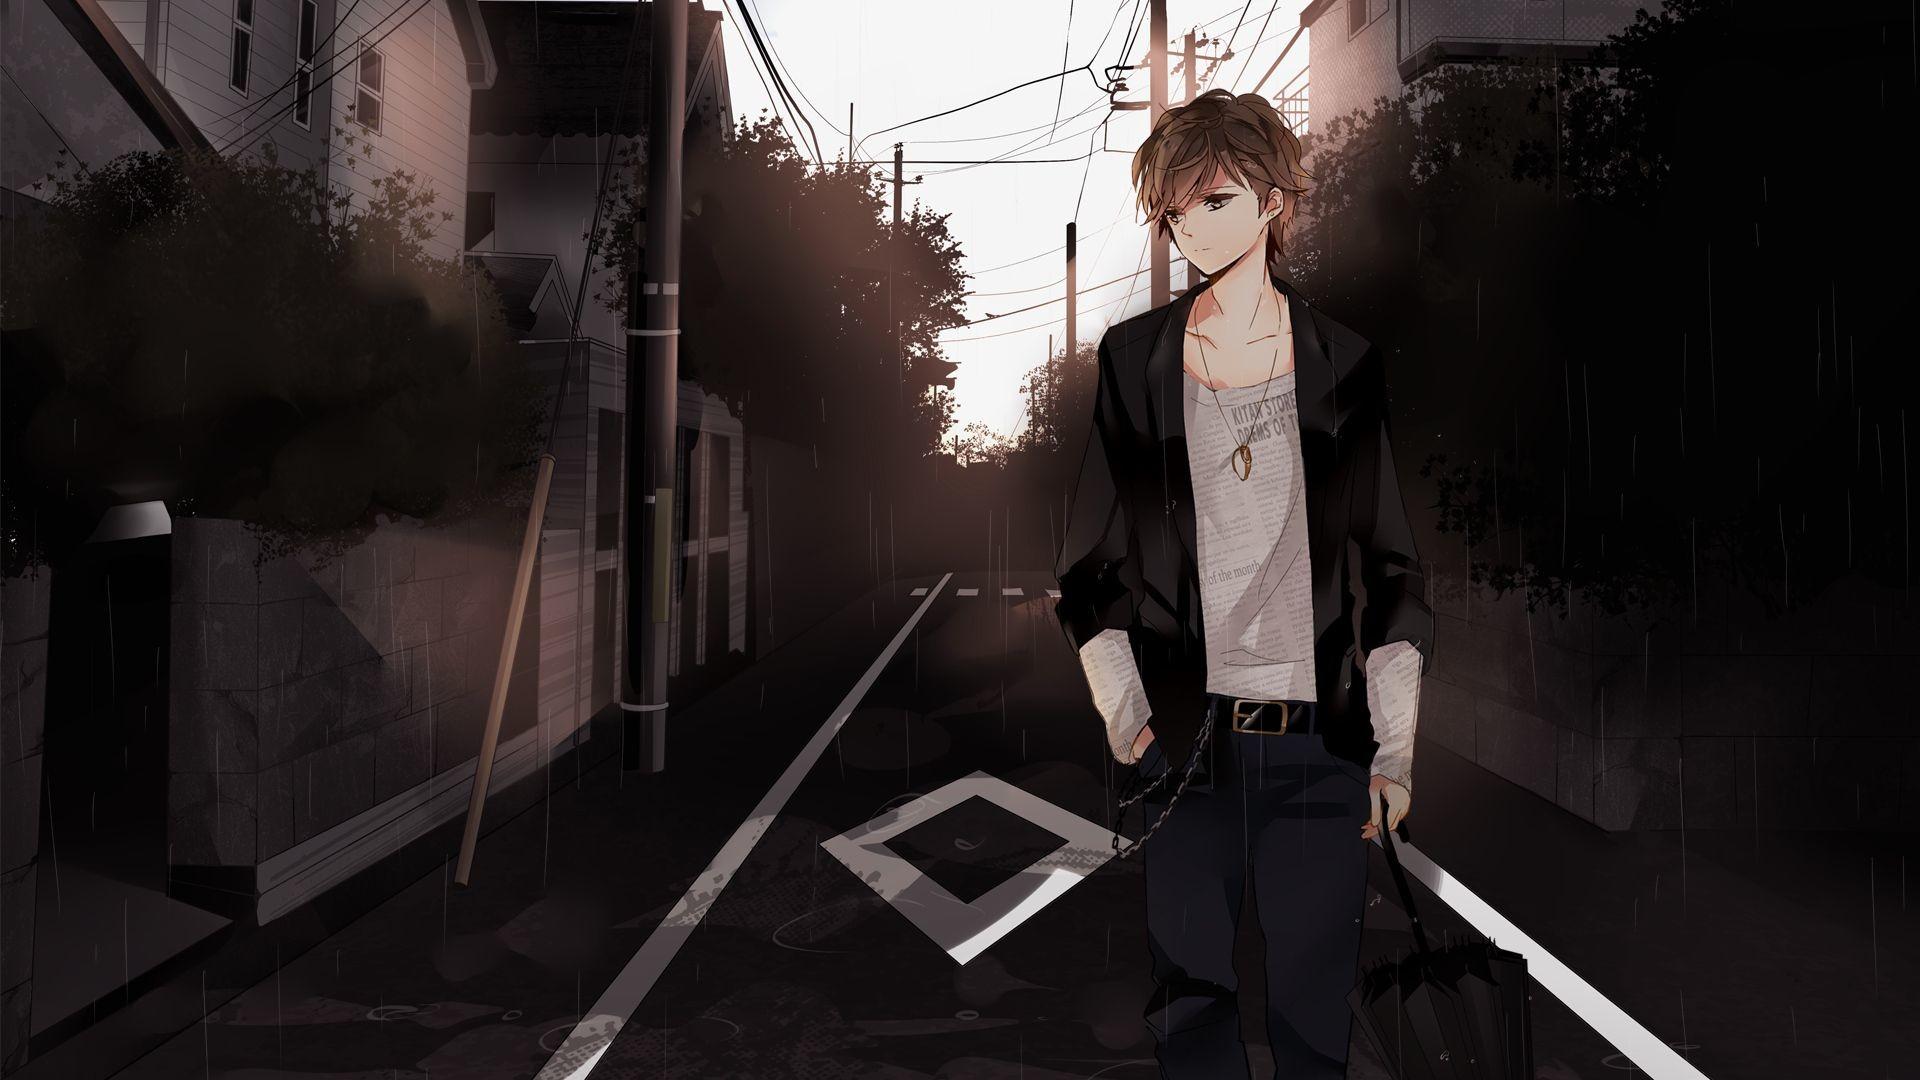 Sad Anime Wallpaper 64 Images